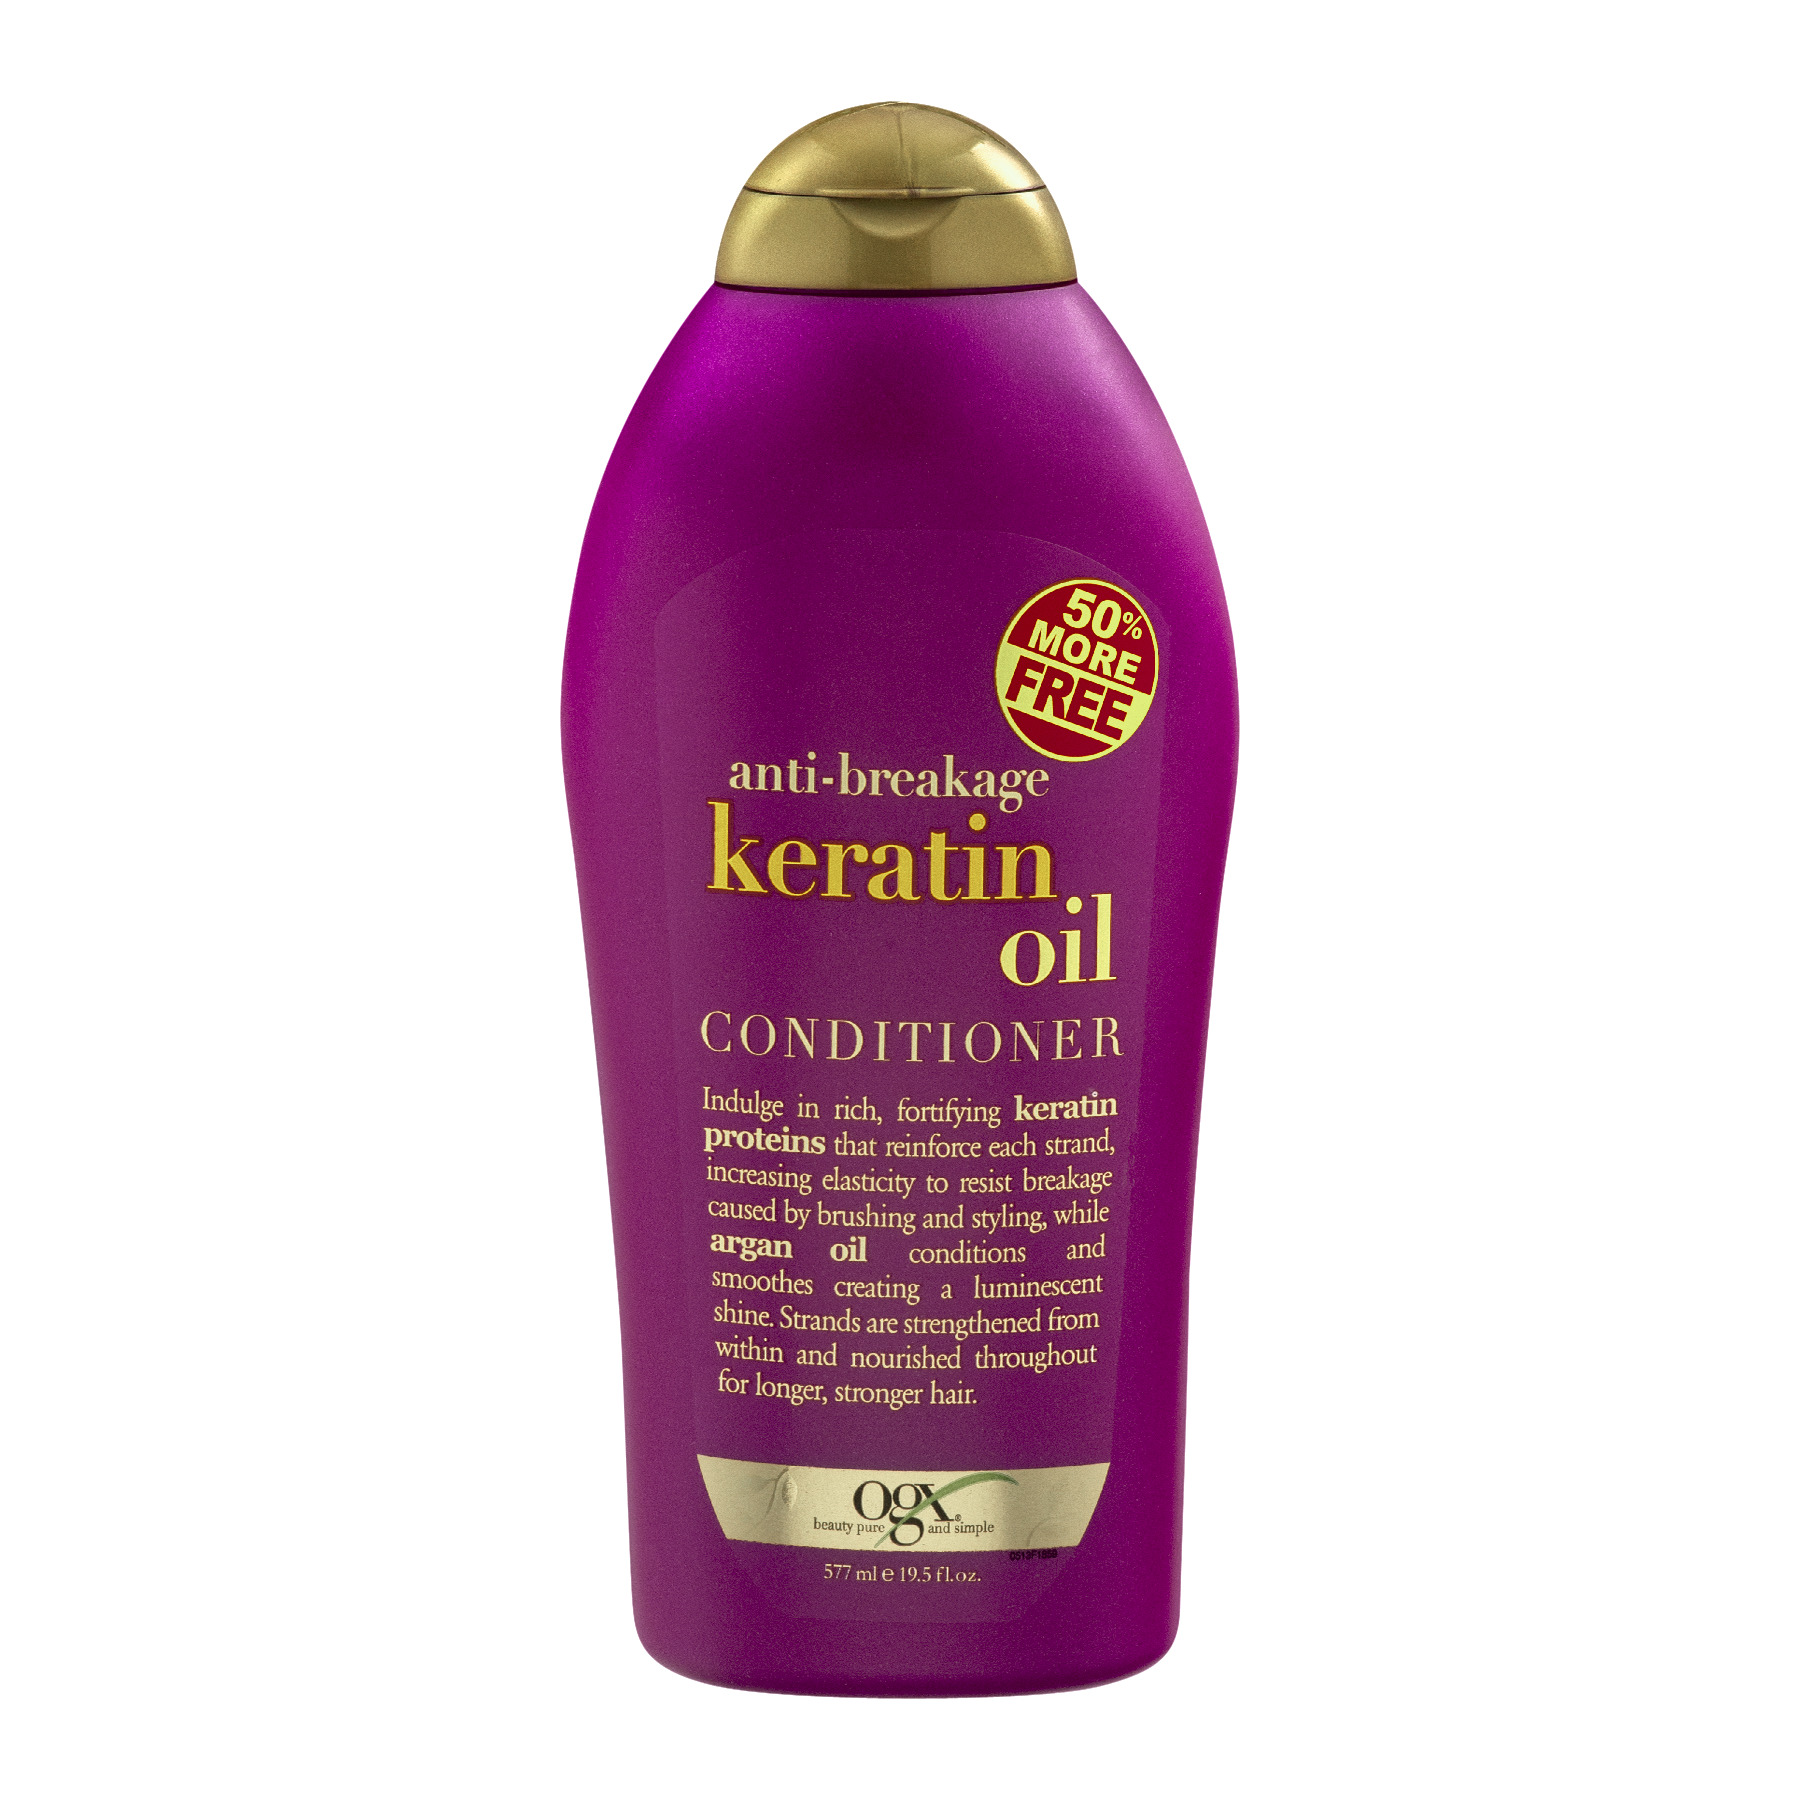 OGX Anti-Breakage Keratin Oil Conditioner, 19.5 FL OZ